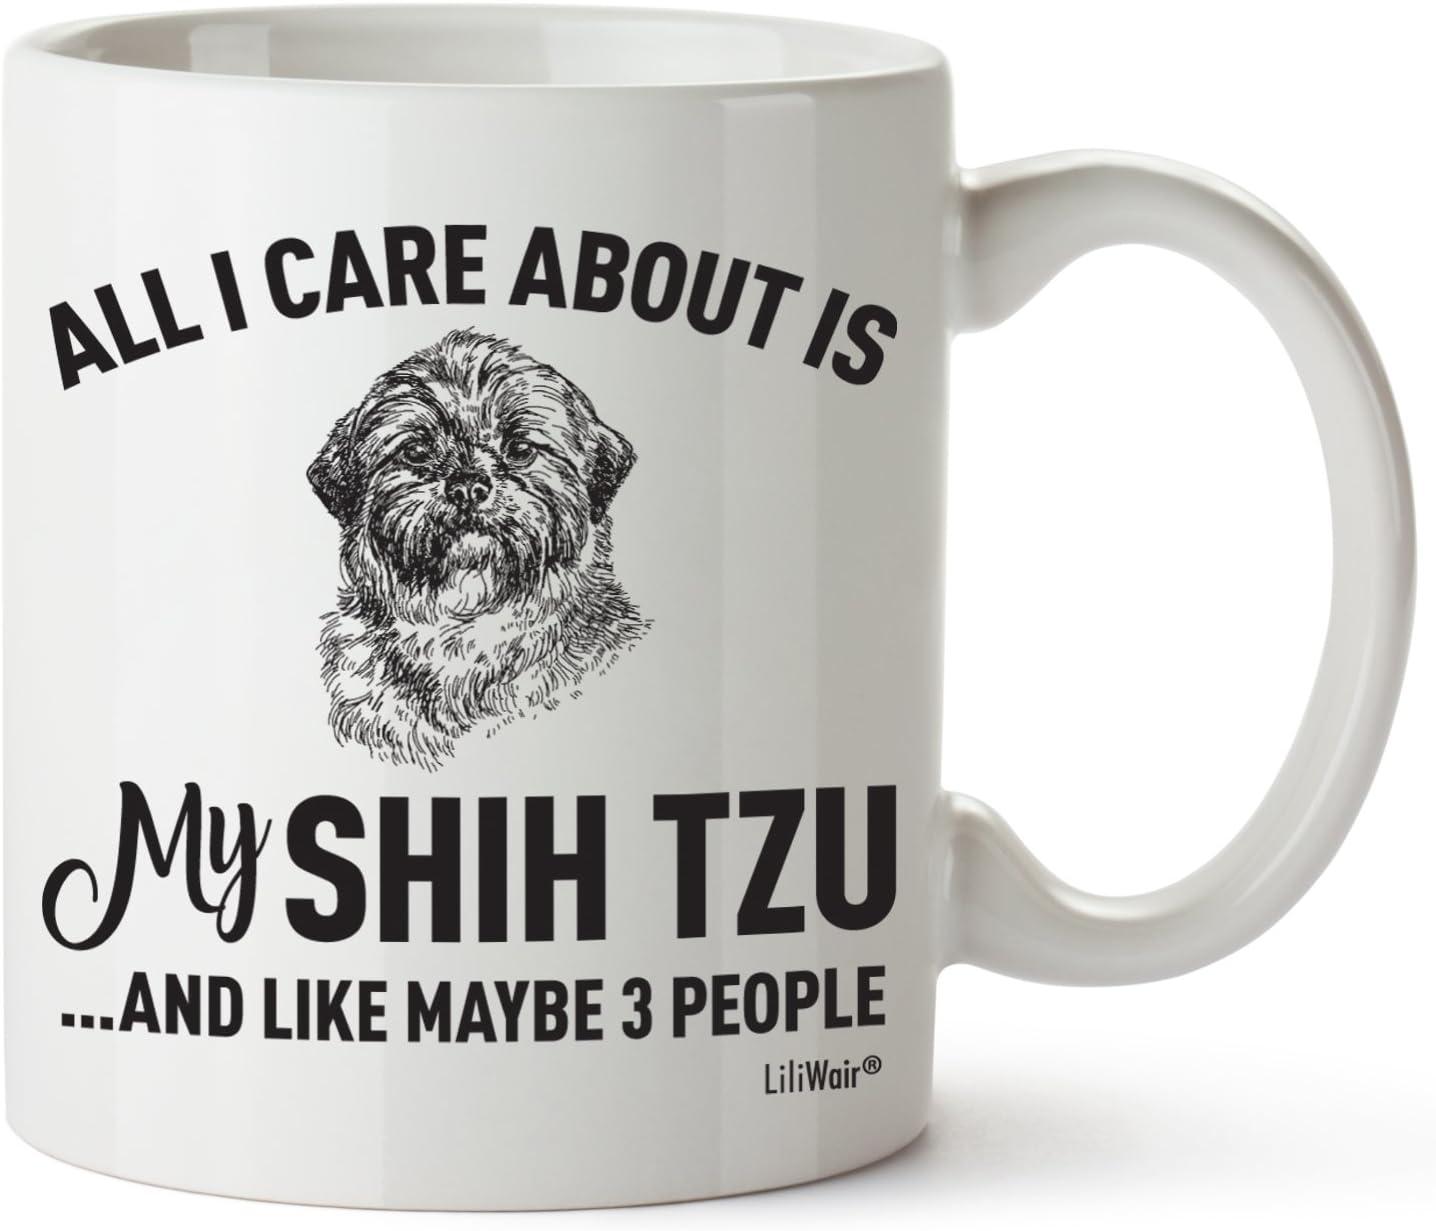 shih tzu stuff